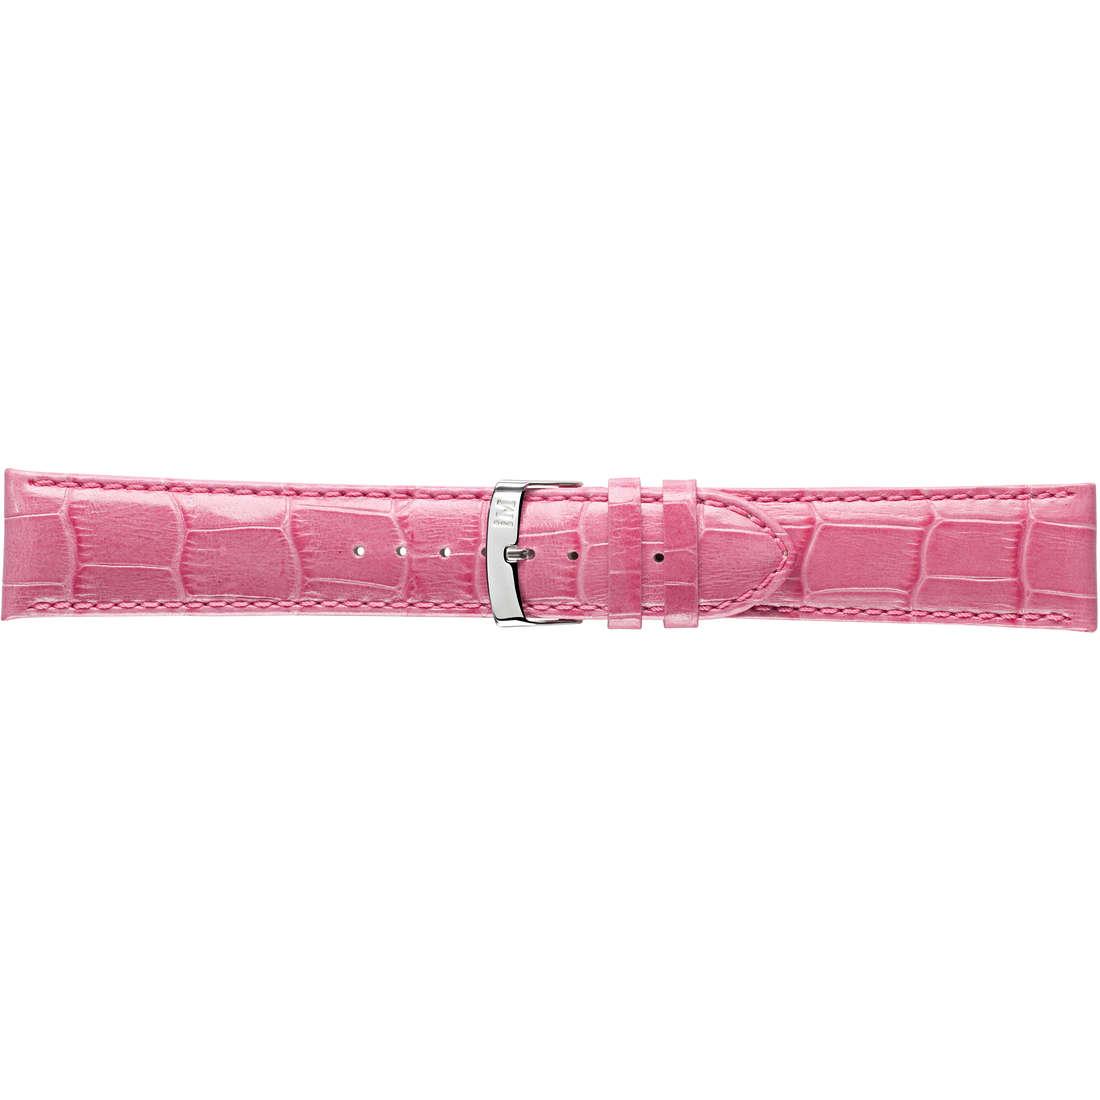 watch watch bands watch straps man Morellato Performance A01X2704656369CR22